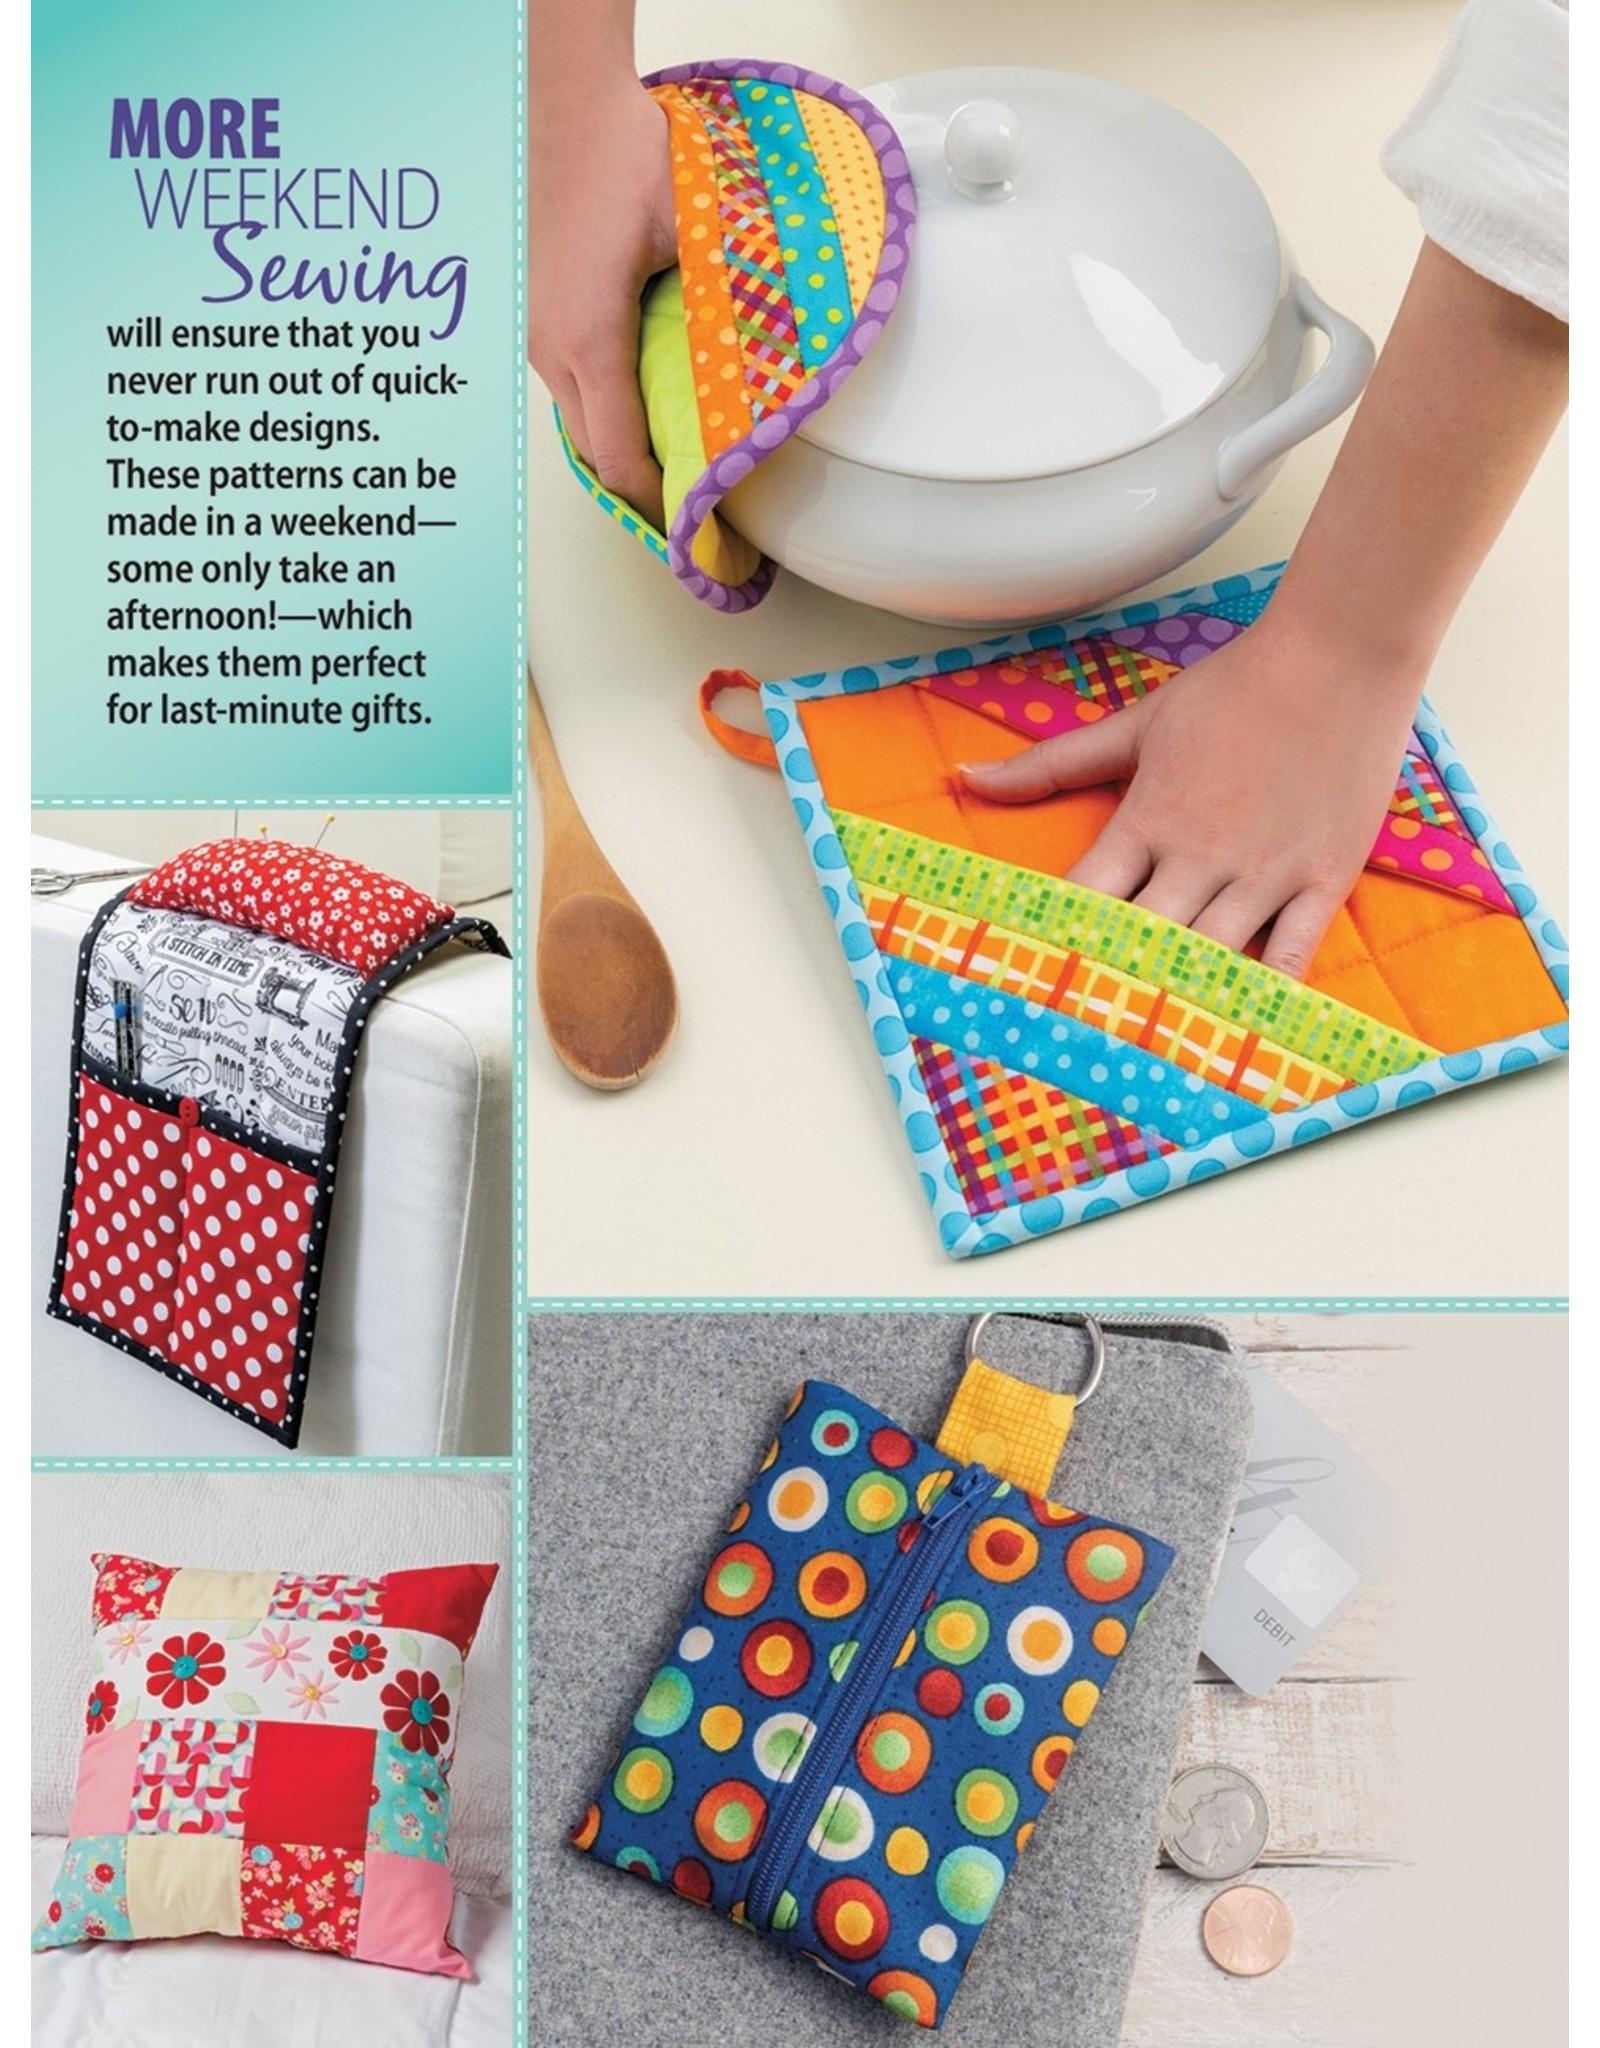 Diversen Annie's Sewing - More Weekend Sewing